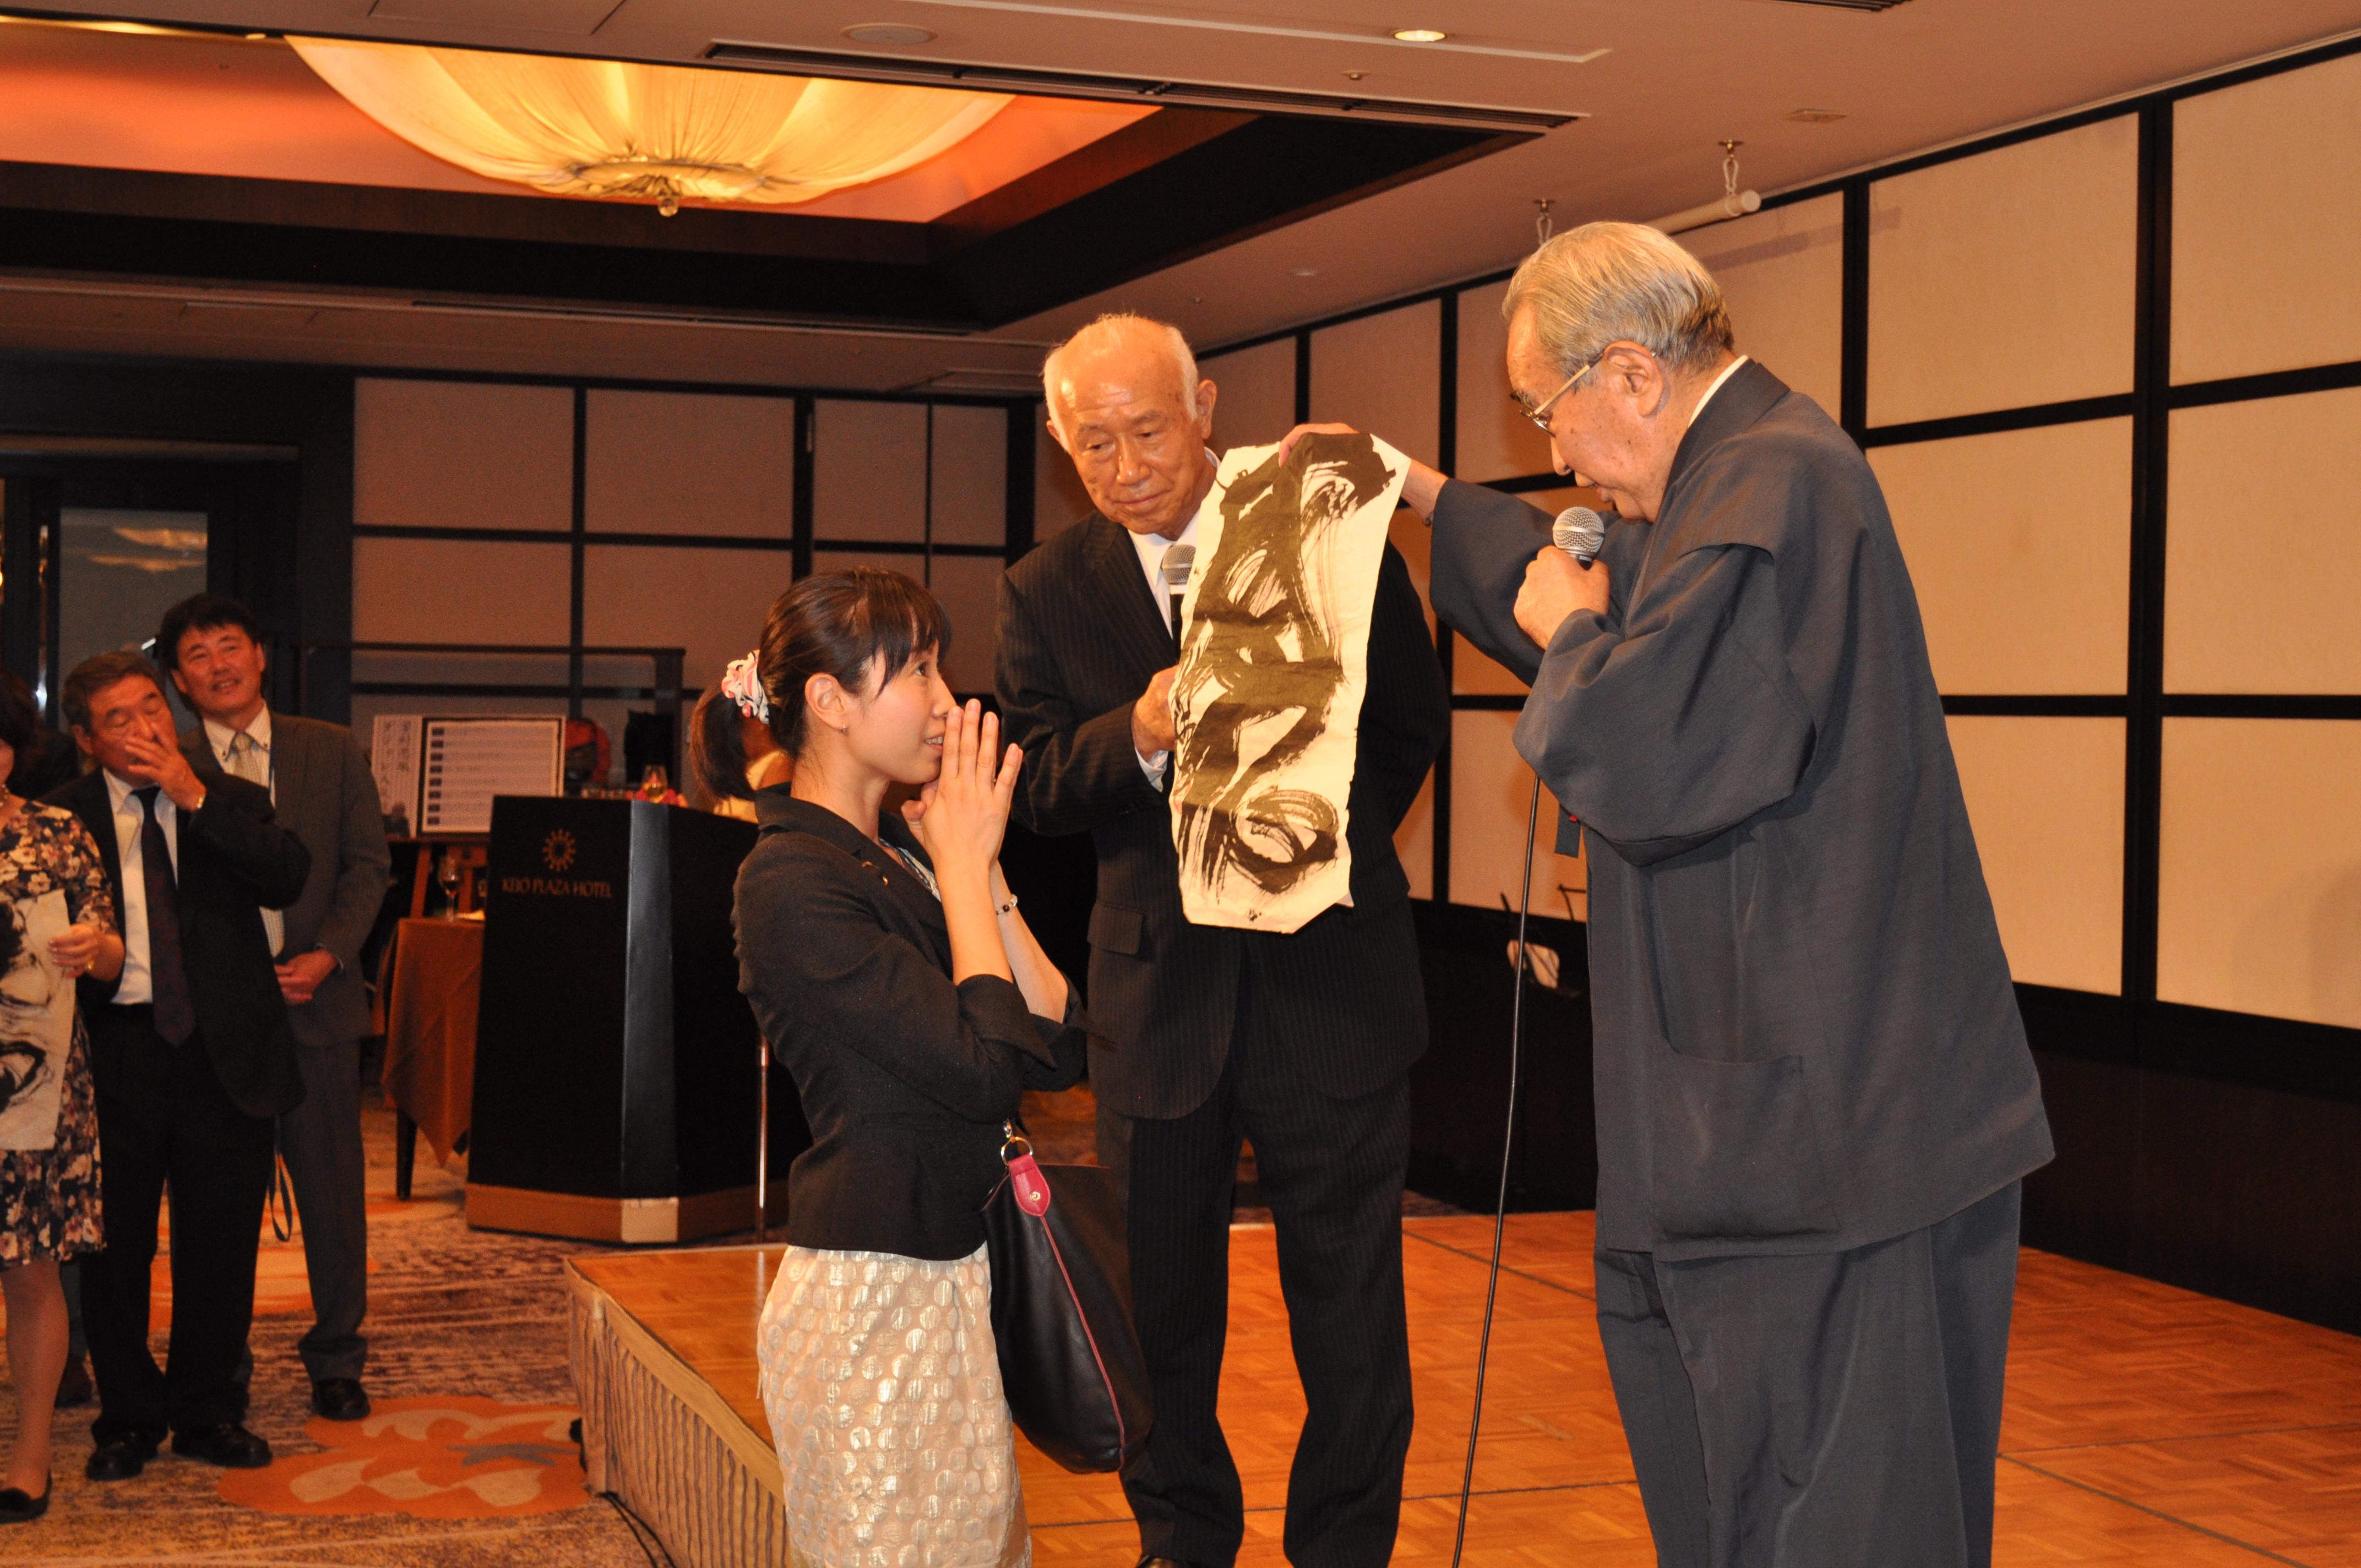 DSC 0565 - 第6回思風会全国大会2018in東京開催